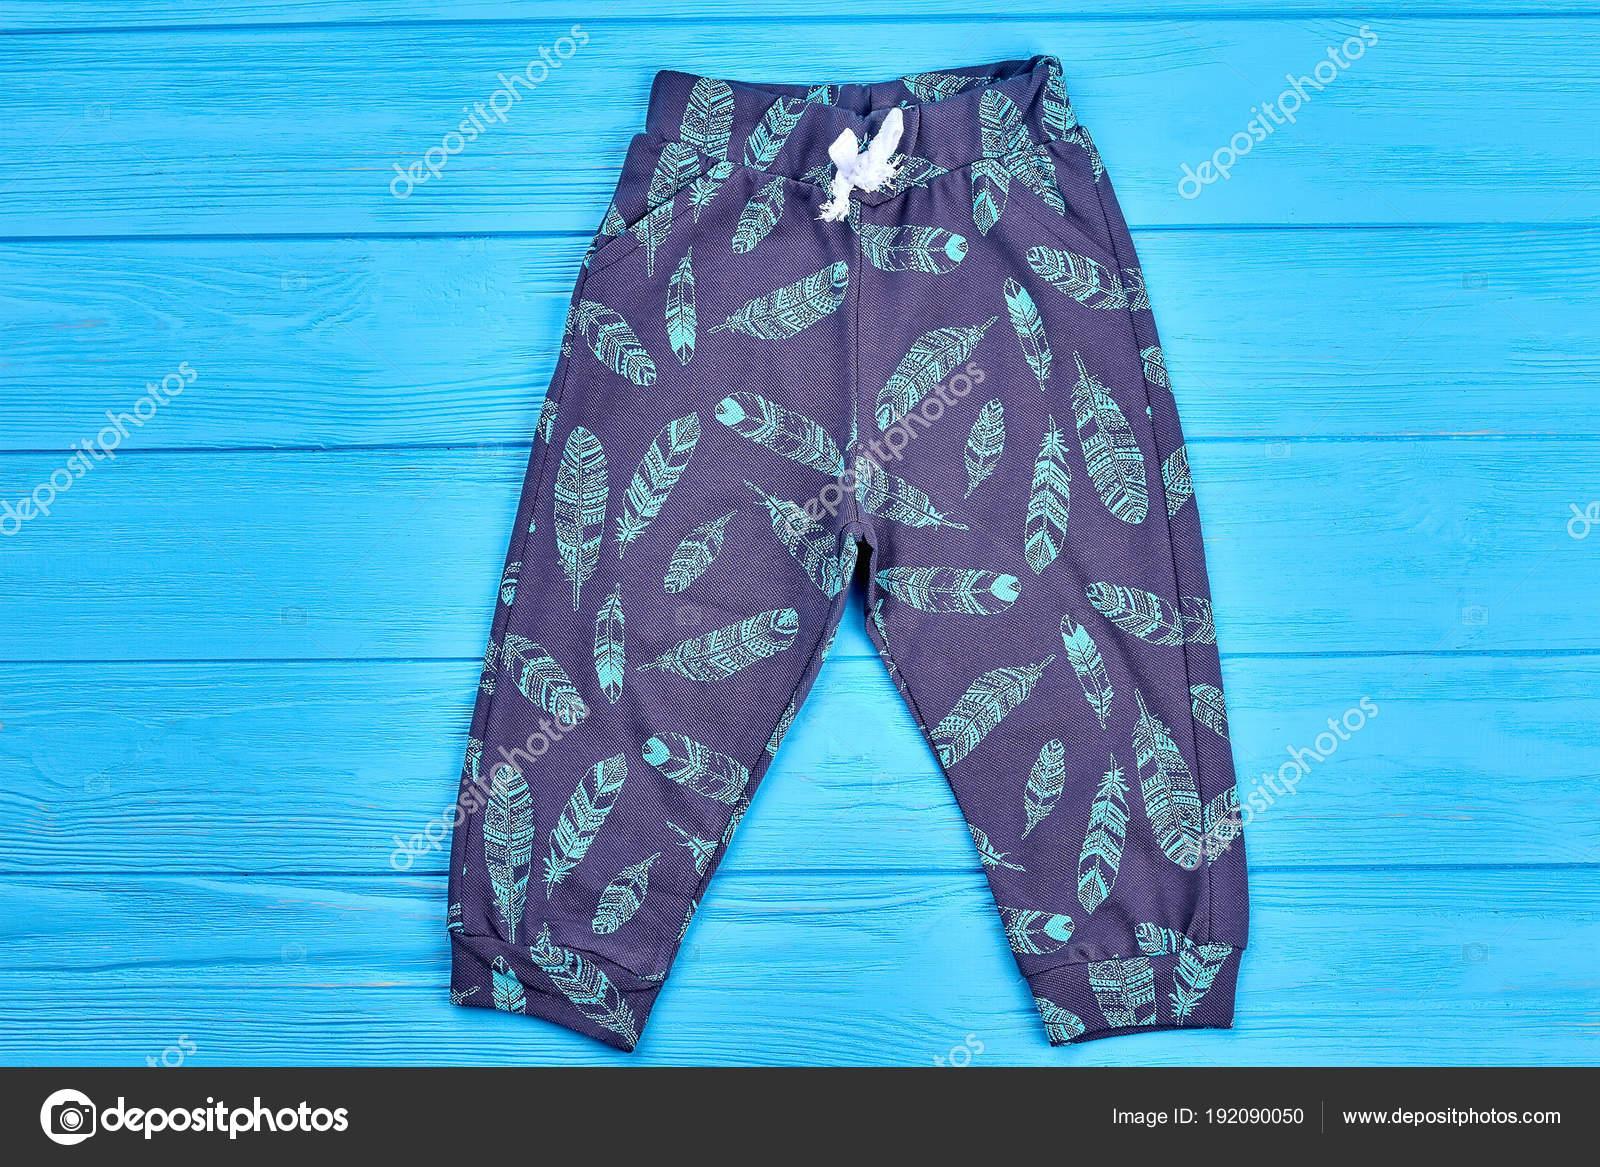 03c57e6853 Kids feather print autumn pants. — Stock Photo © Denisfilm  192090050